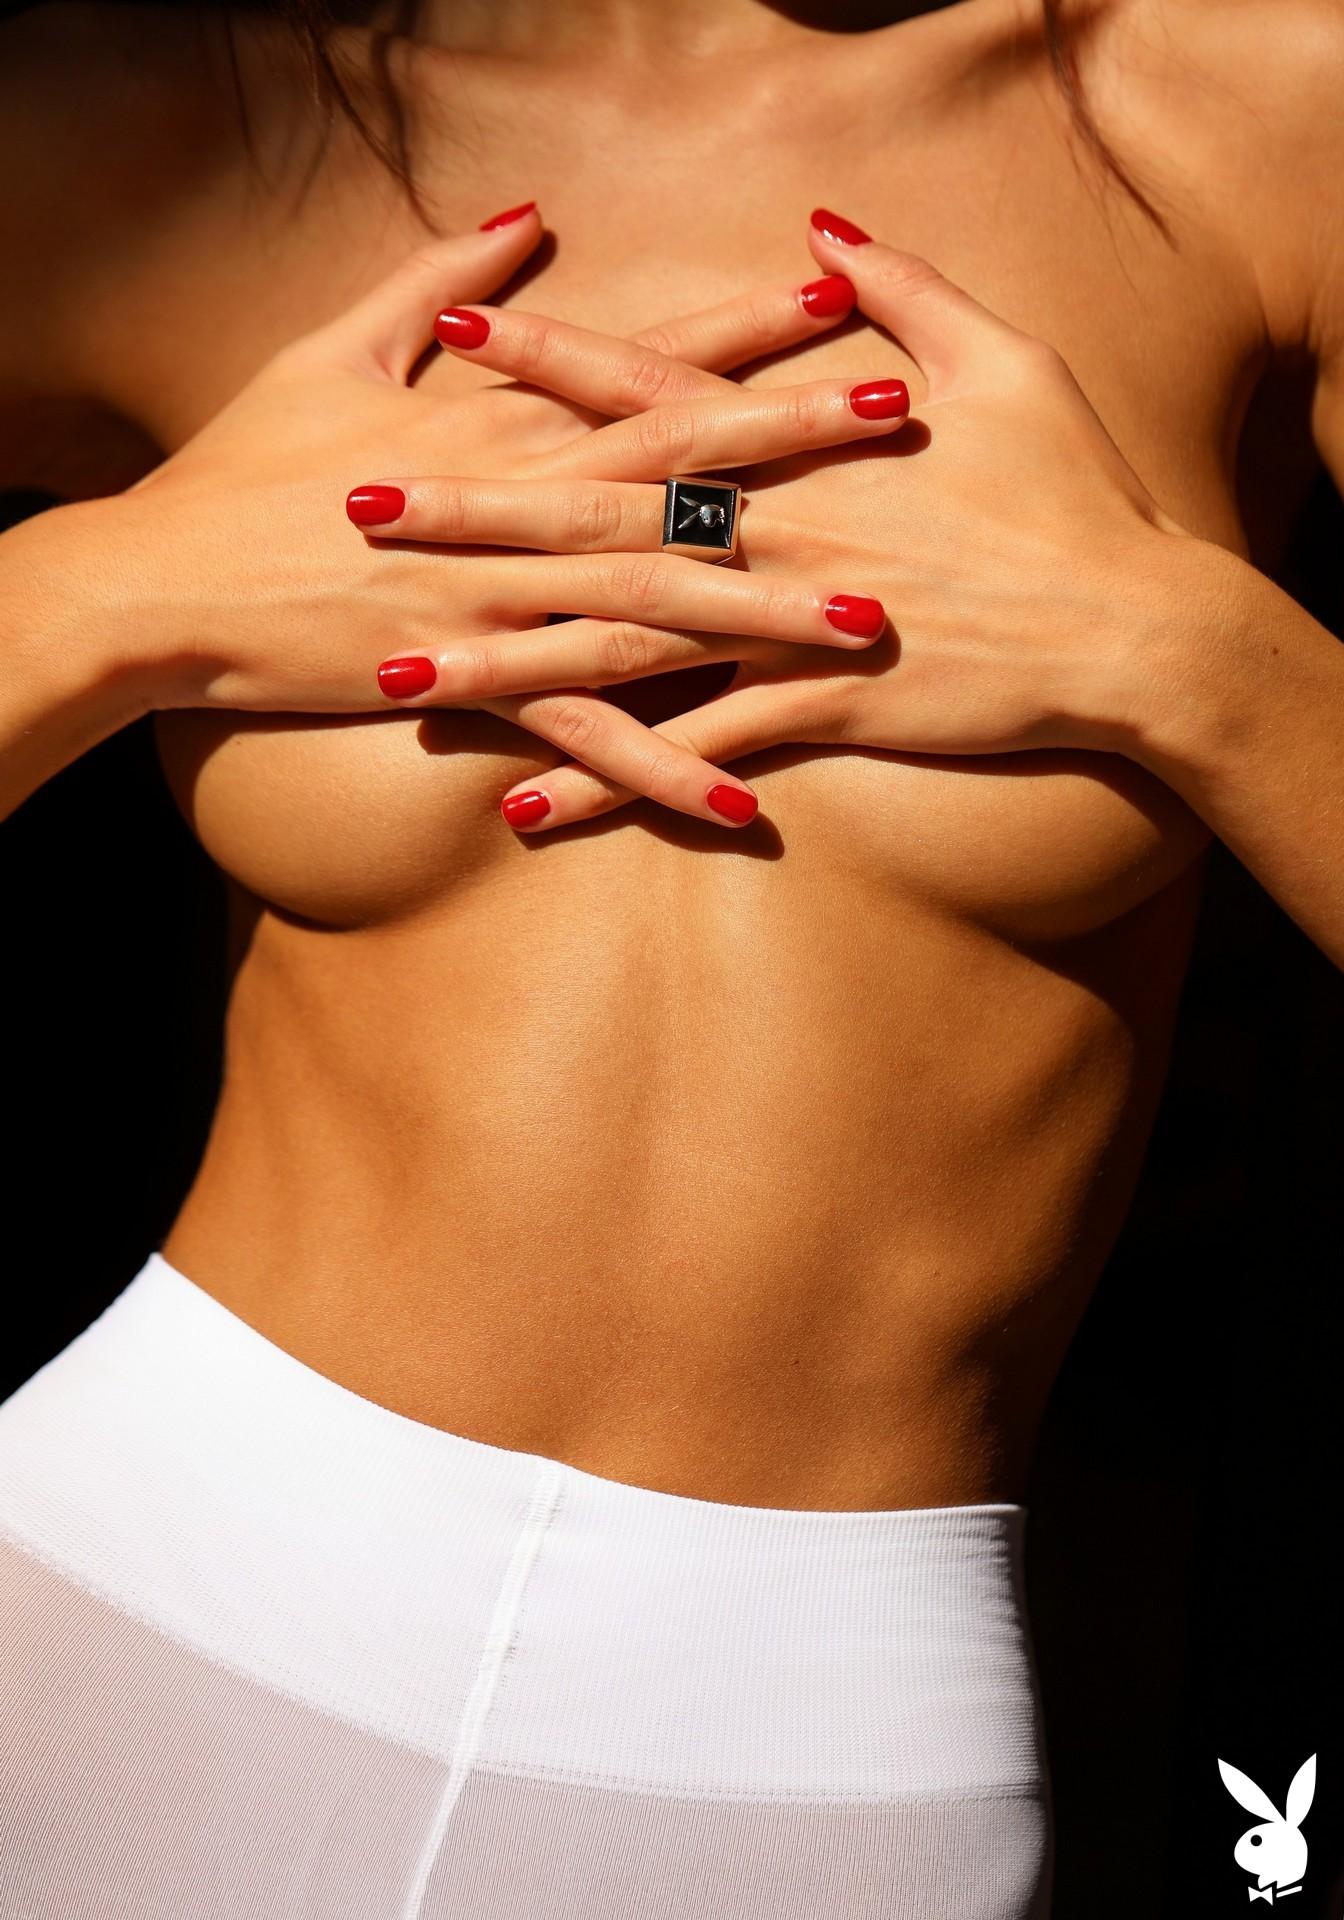 Cledia Fortin For Playboy International Playboy Plus (16)